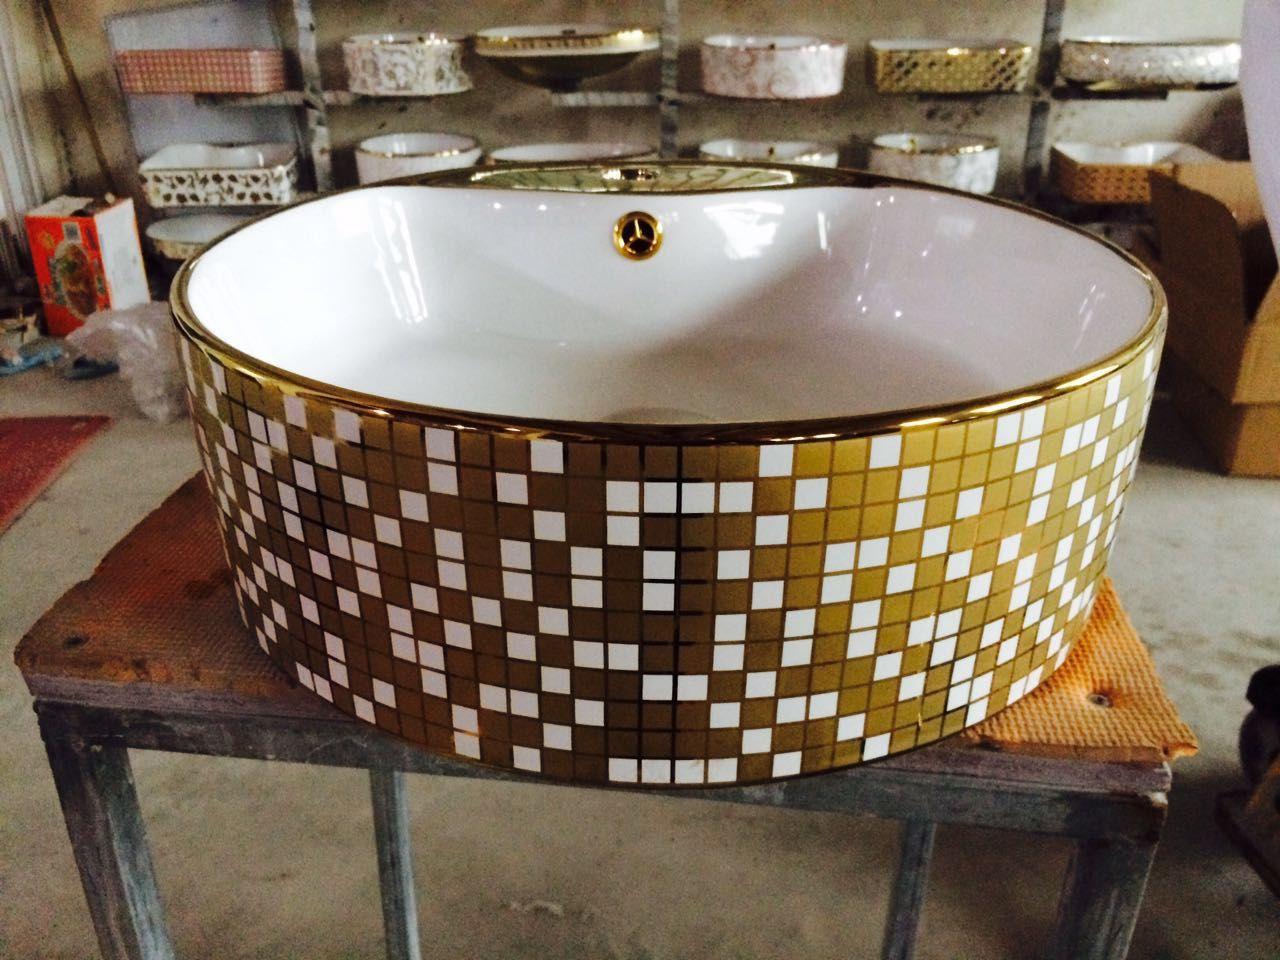 2018 Ceramic Gold Wash Basin For Bathroom Art Basin Golden Design From  Amyyaoyy, $226.14 | Dhgate.Com